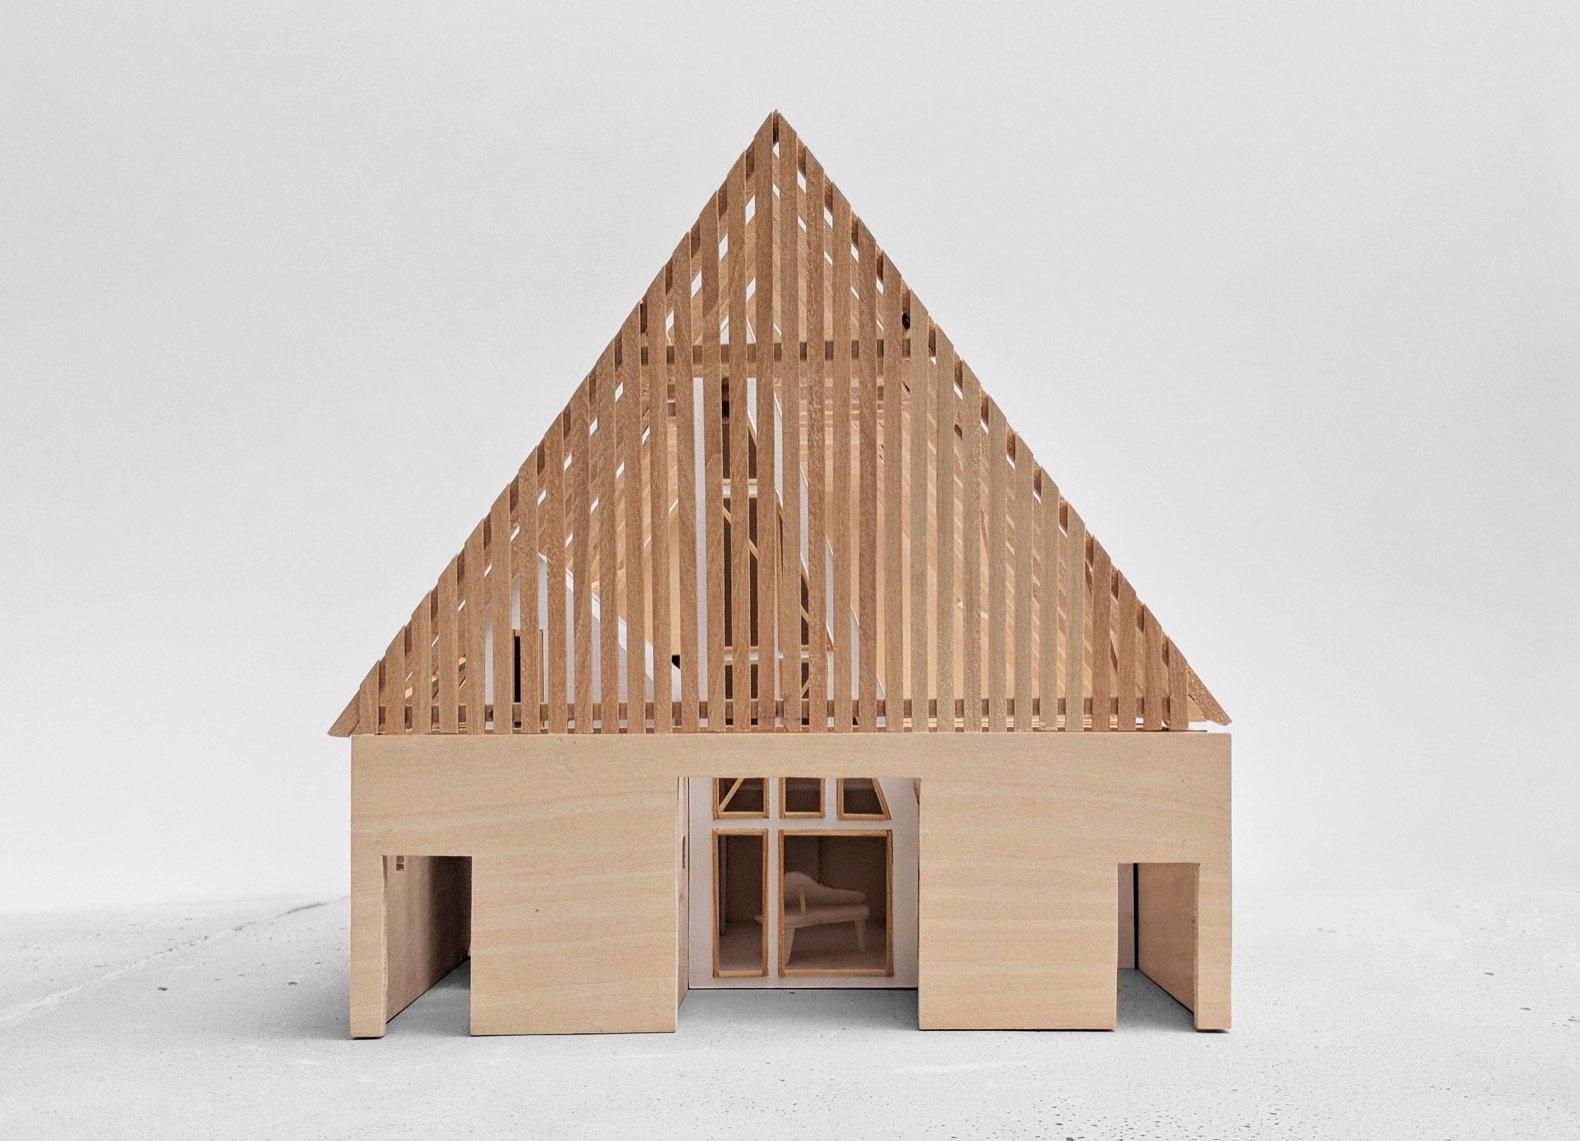 Dortmannhof model